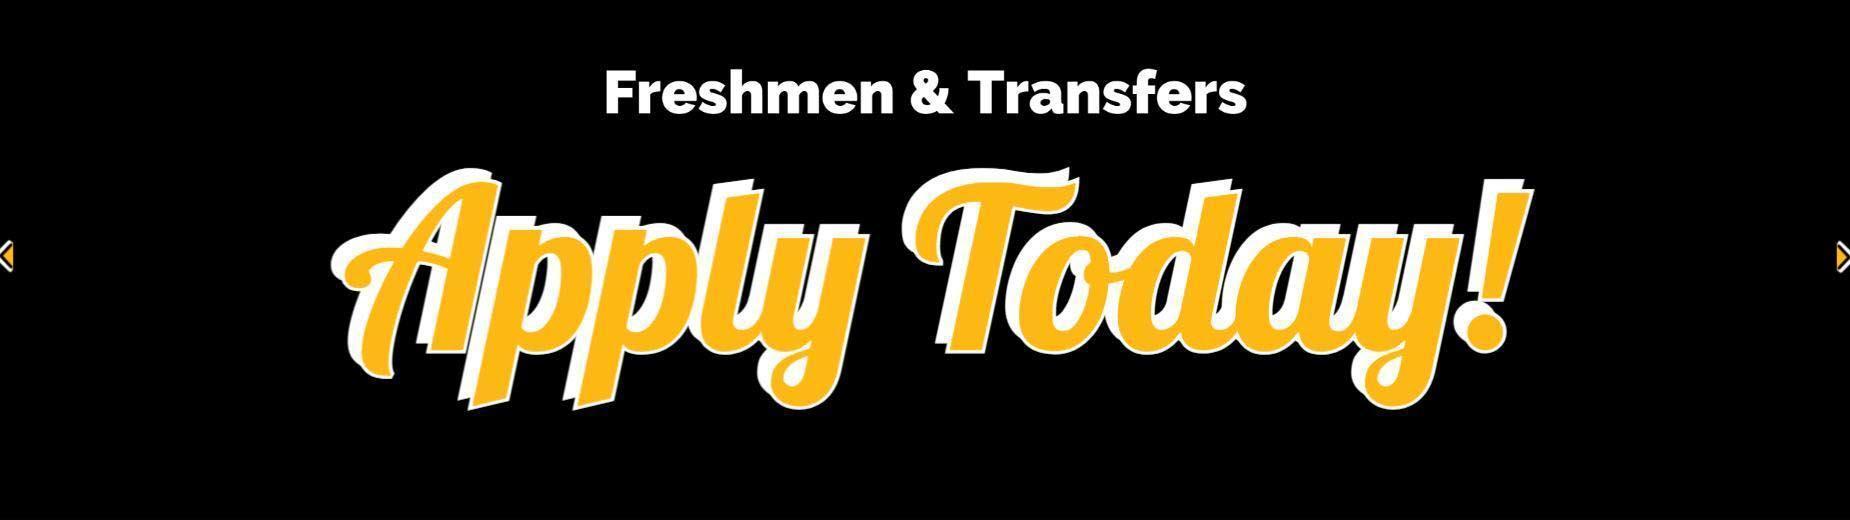 Freshmen and transfers, apply today!